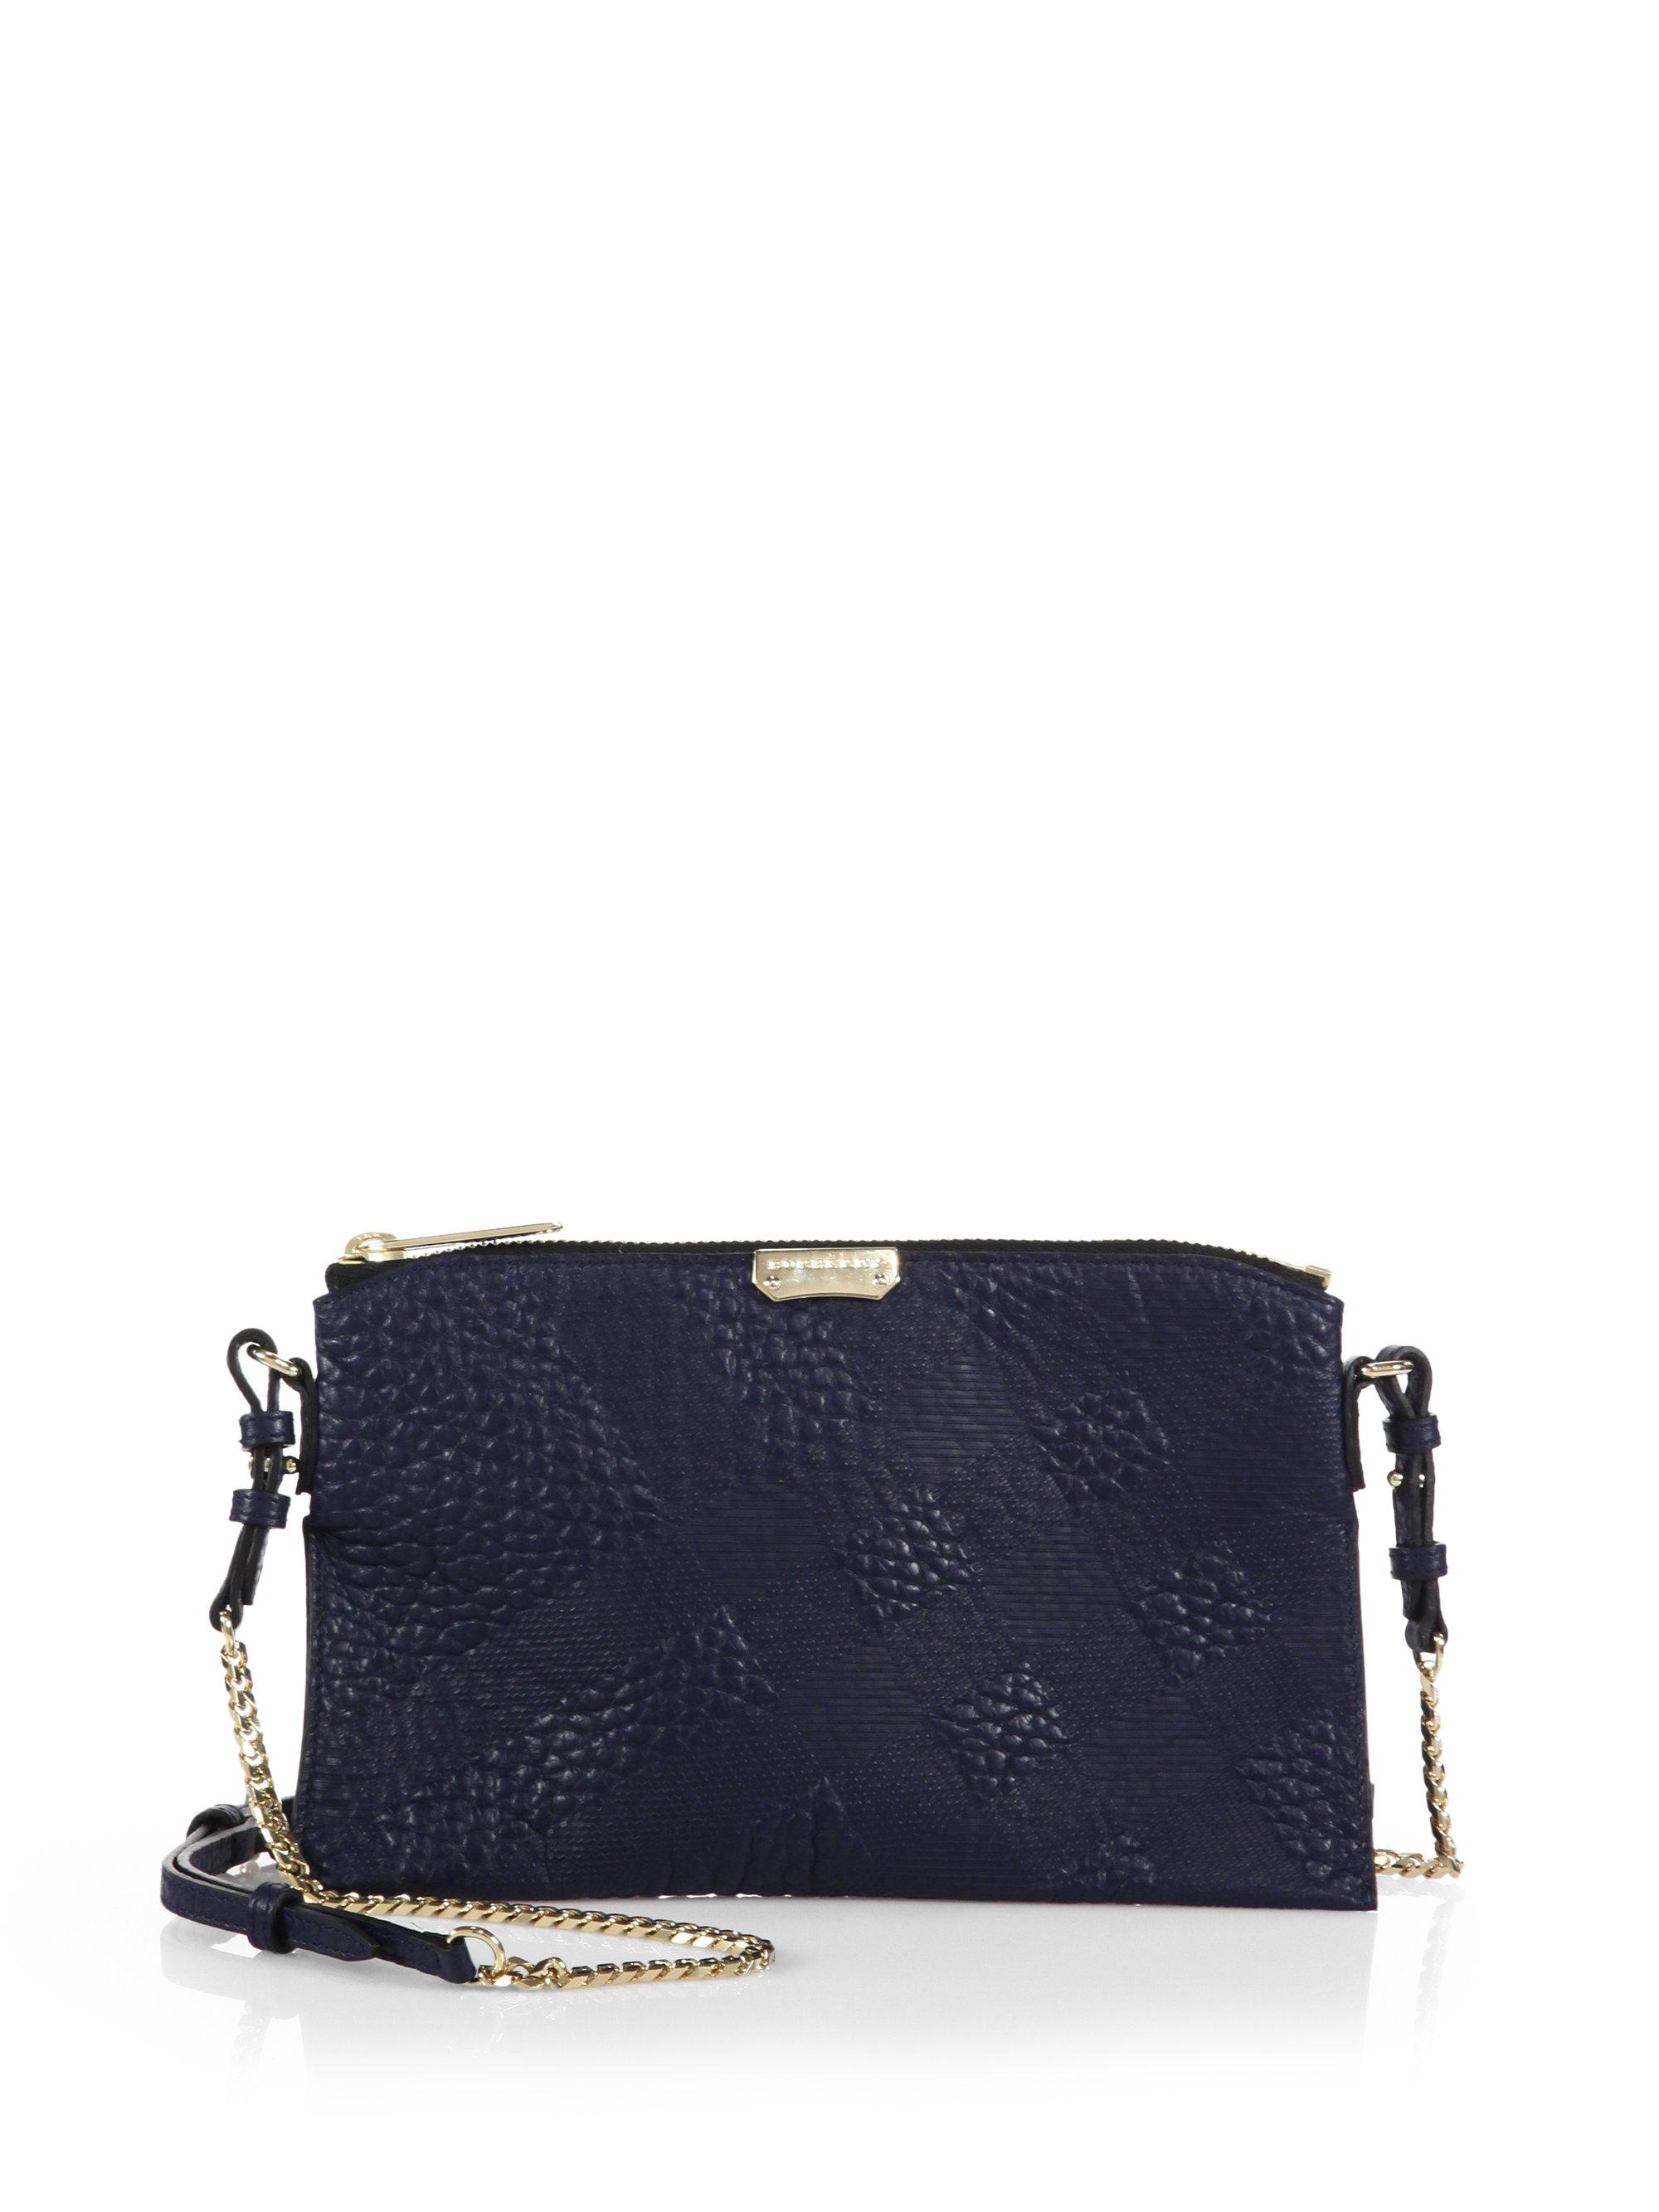 Lyst - Burberry Peyton Plaid-Embossed Crossbody Bag in Blue 2f948ee79b